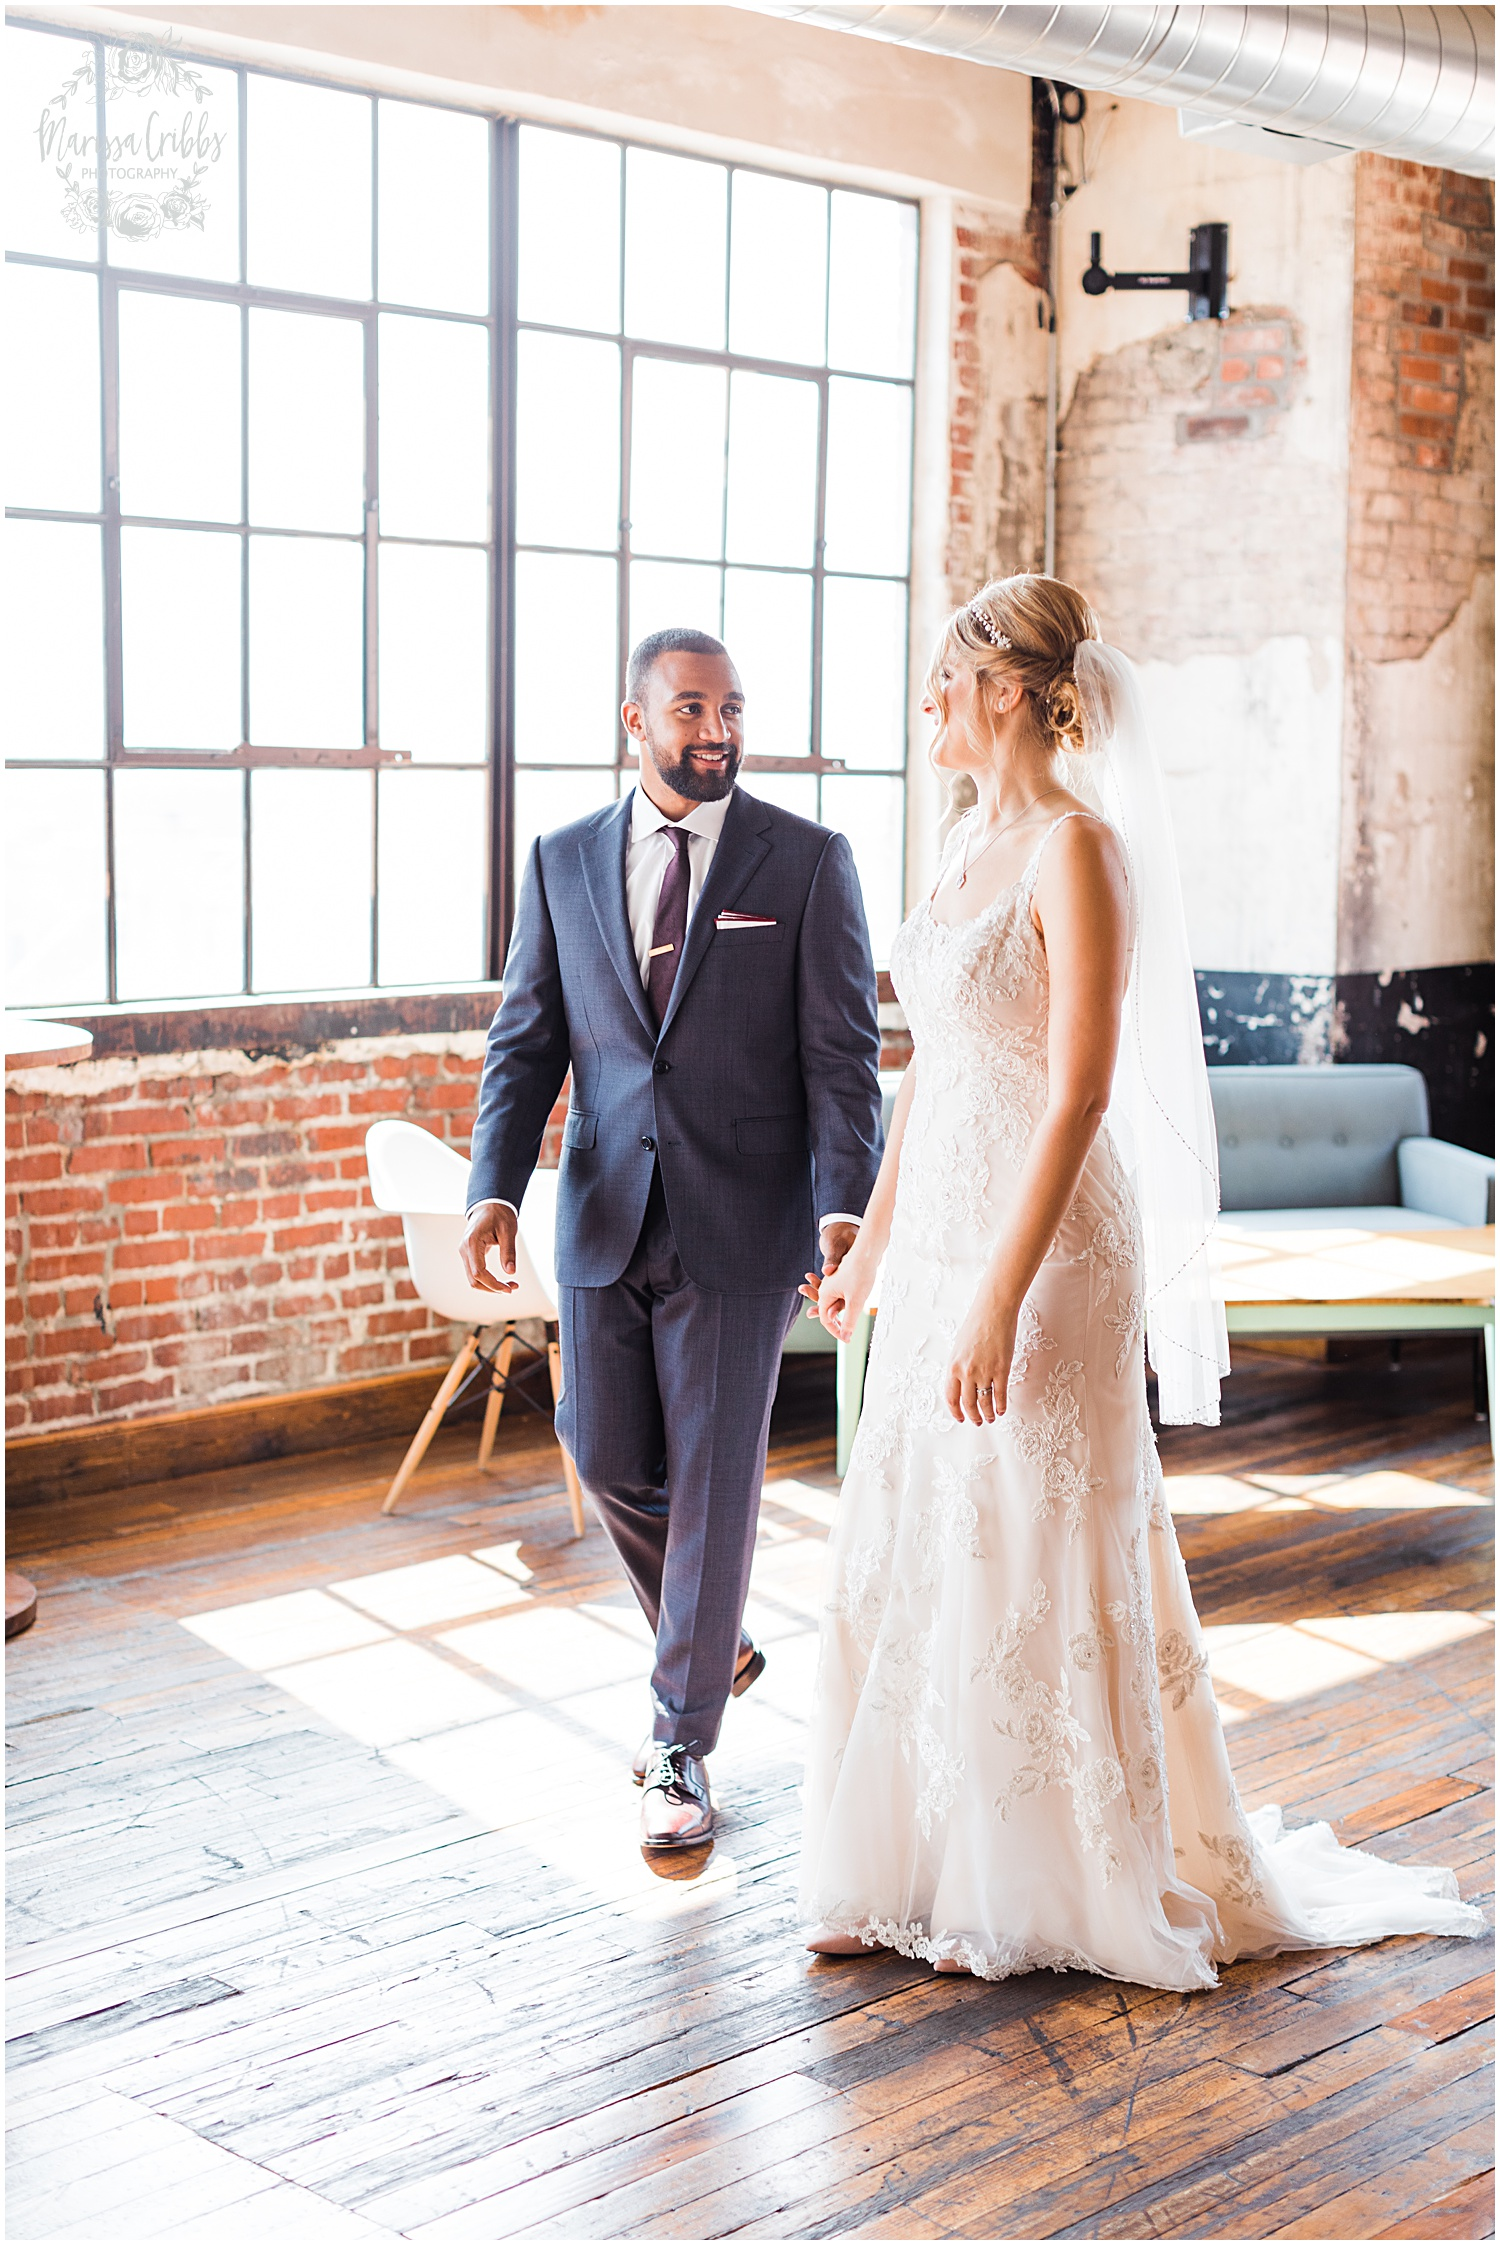 BAUER WEDDING   KELSEA & JUSTIN   MARISSA CRIBBS PHOTOGRAPHY_6510.jpg